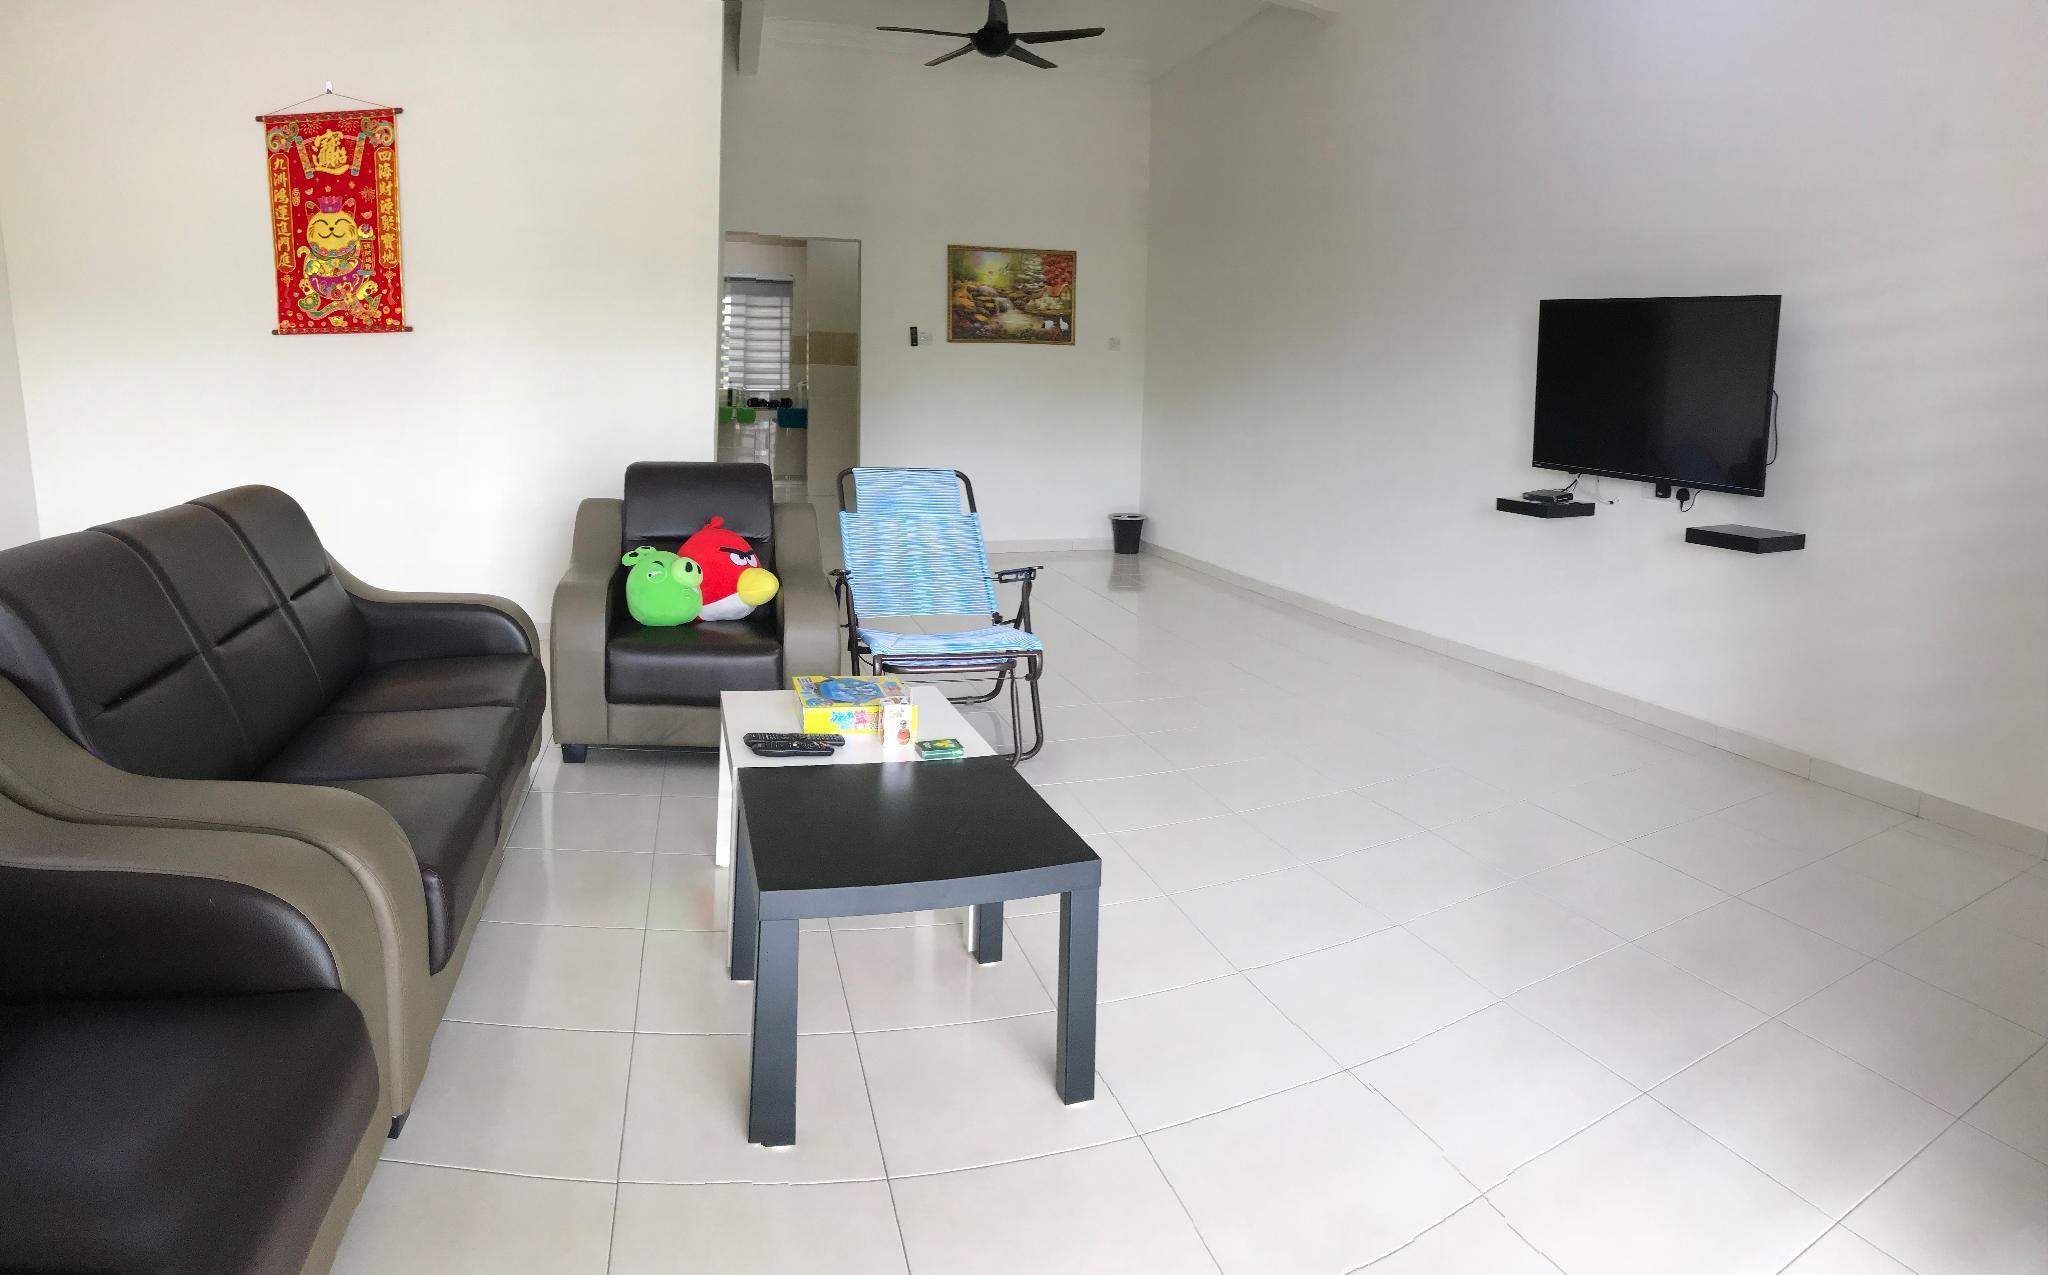 My STW Home